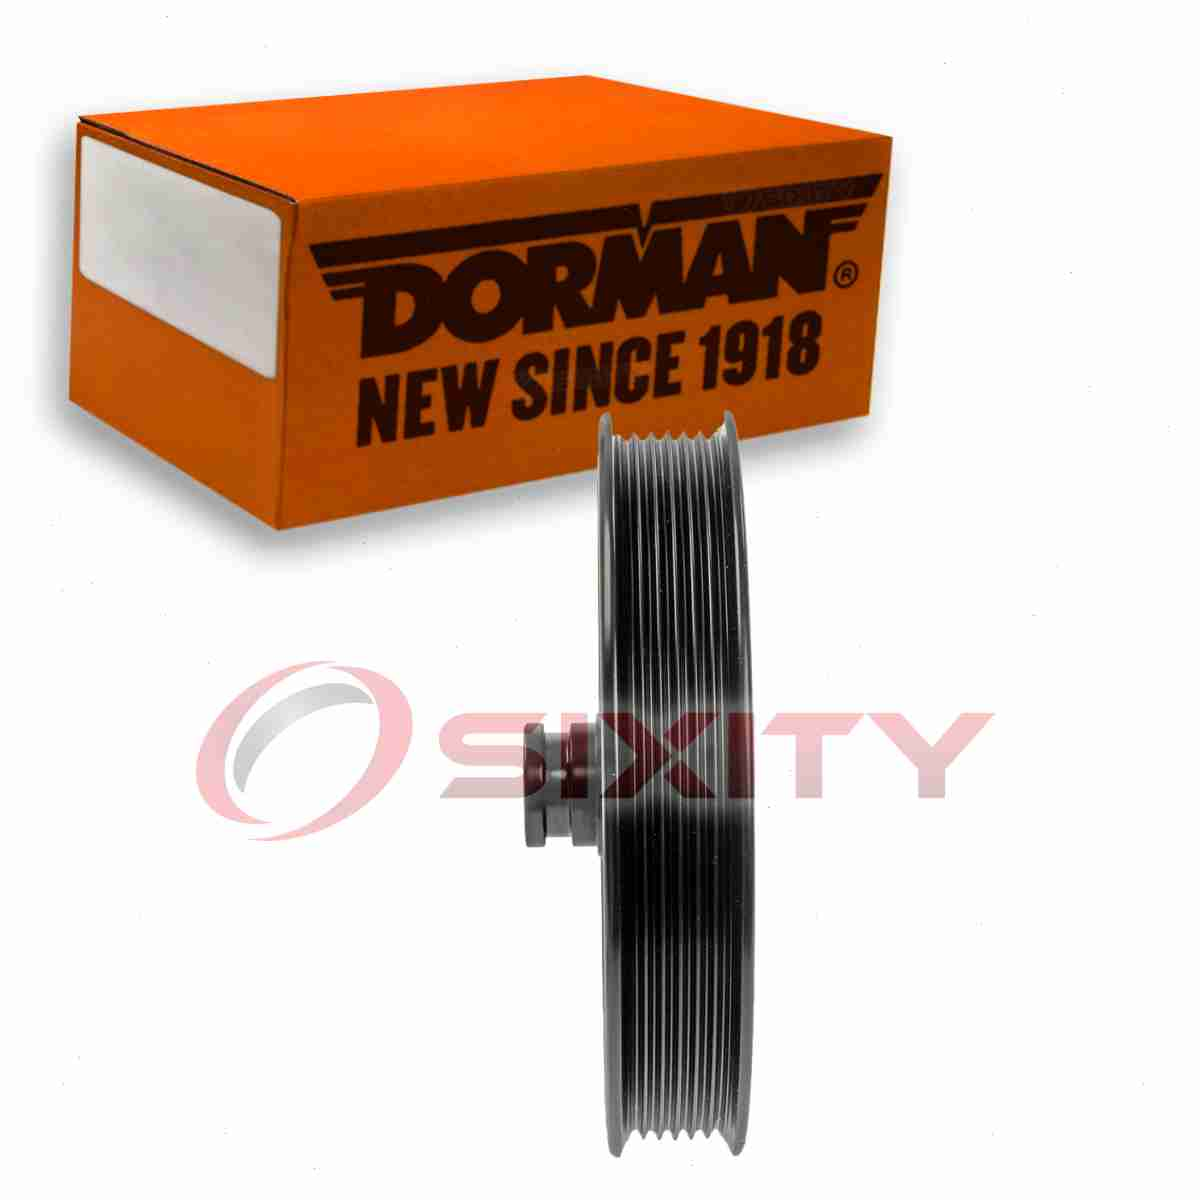 Dorman Power Steering Pump Pulley for Chevy Silverado 2500 1999-2004 6.0L V8 hs